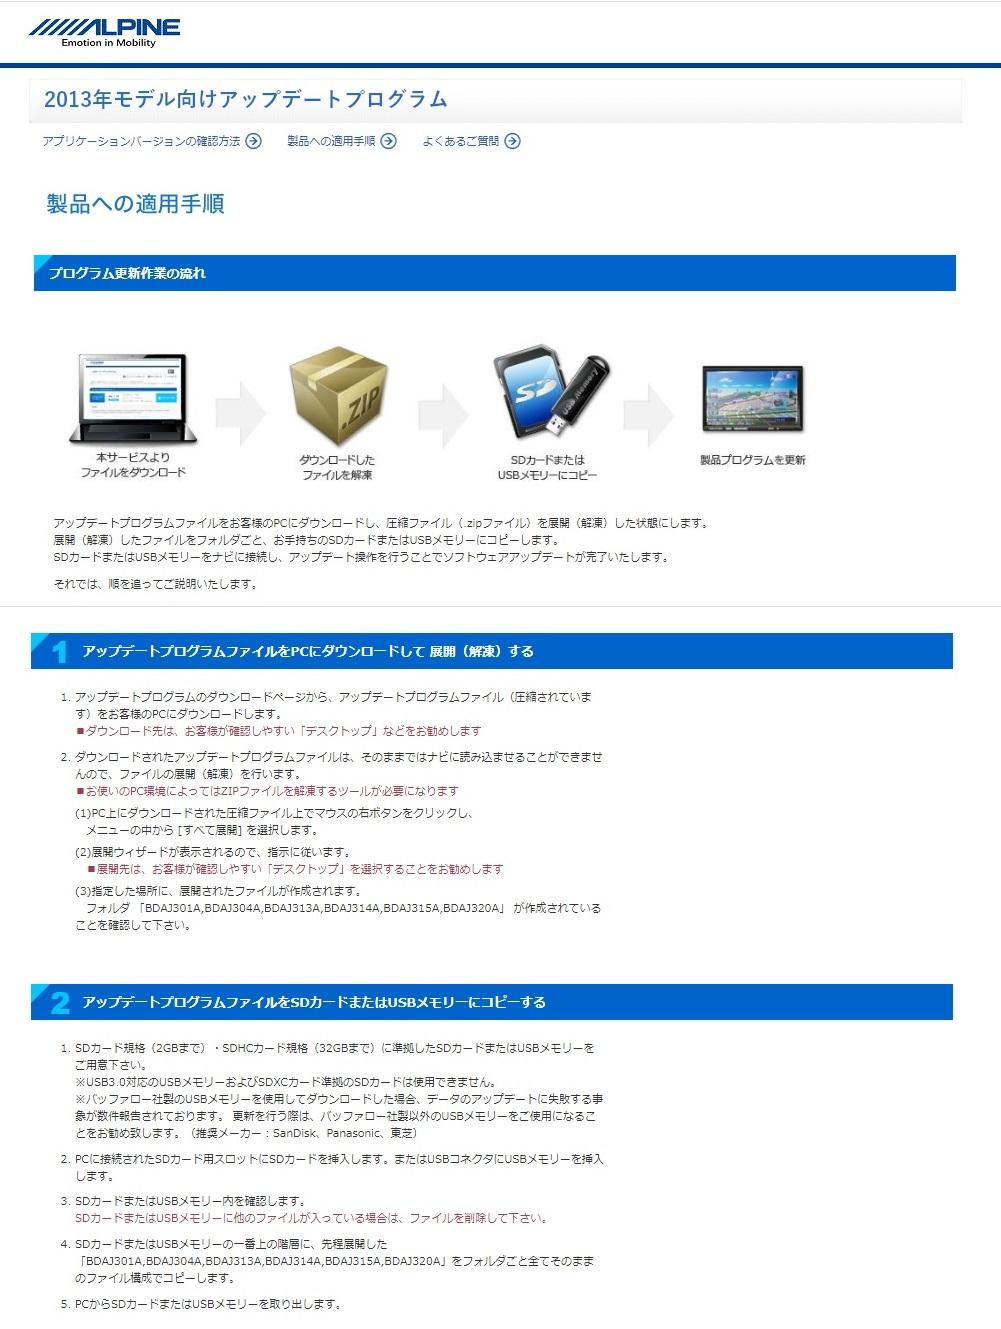 ALPINE ナビ 2012~2015年モデル 再起動事象対策ソフトウェア